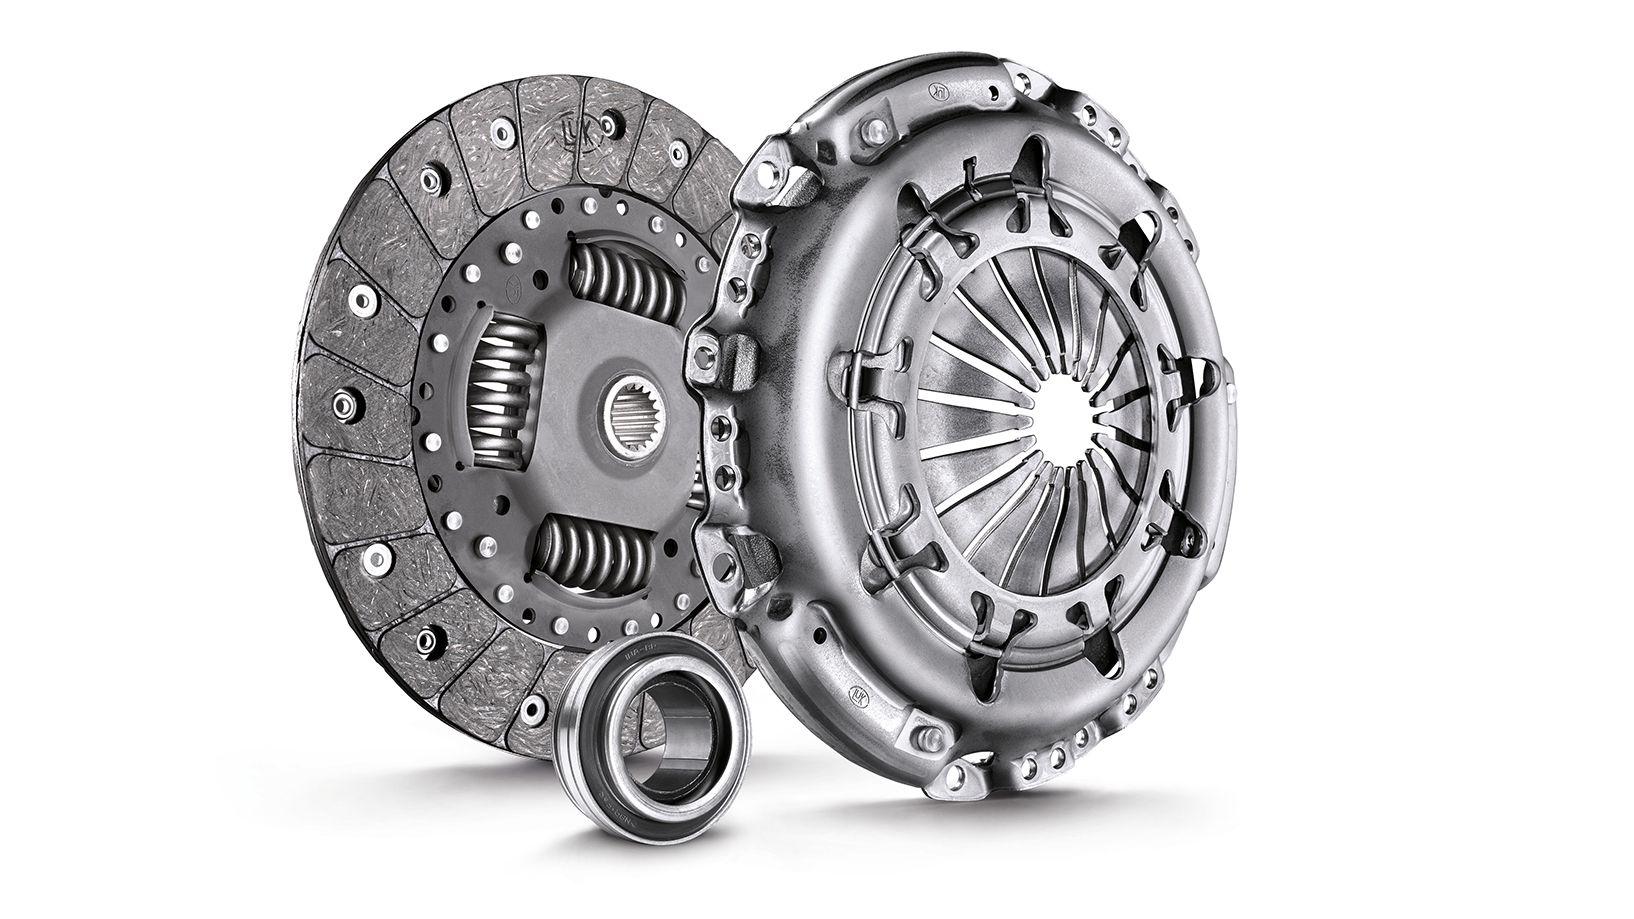 Luk Rep Set For Tata Magic Heavy duty 170 - 6173009000